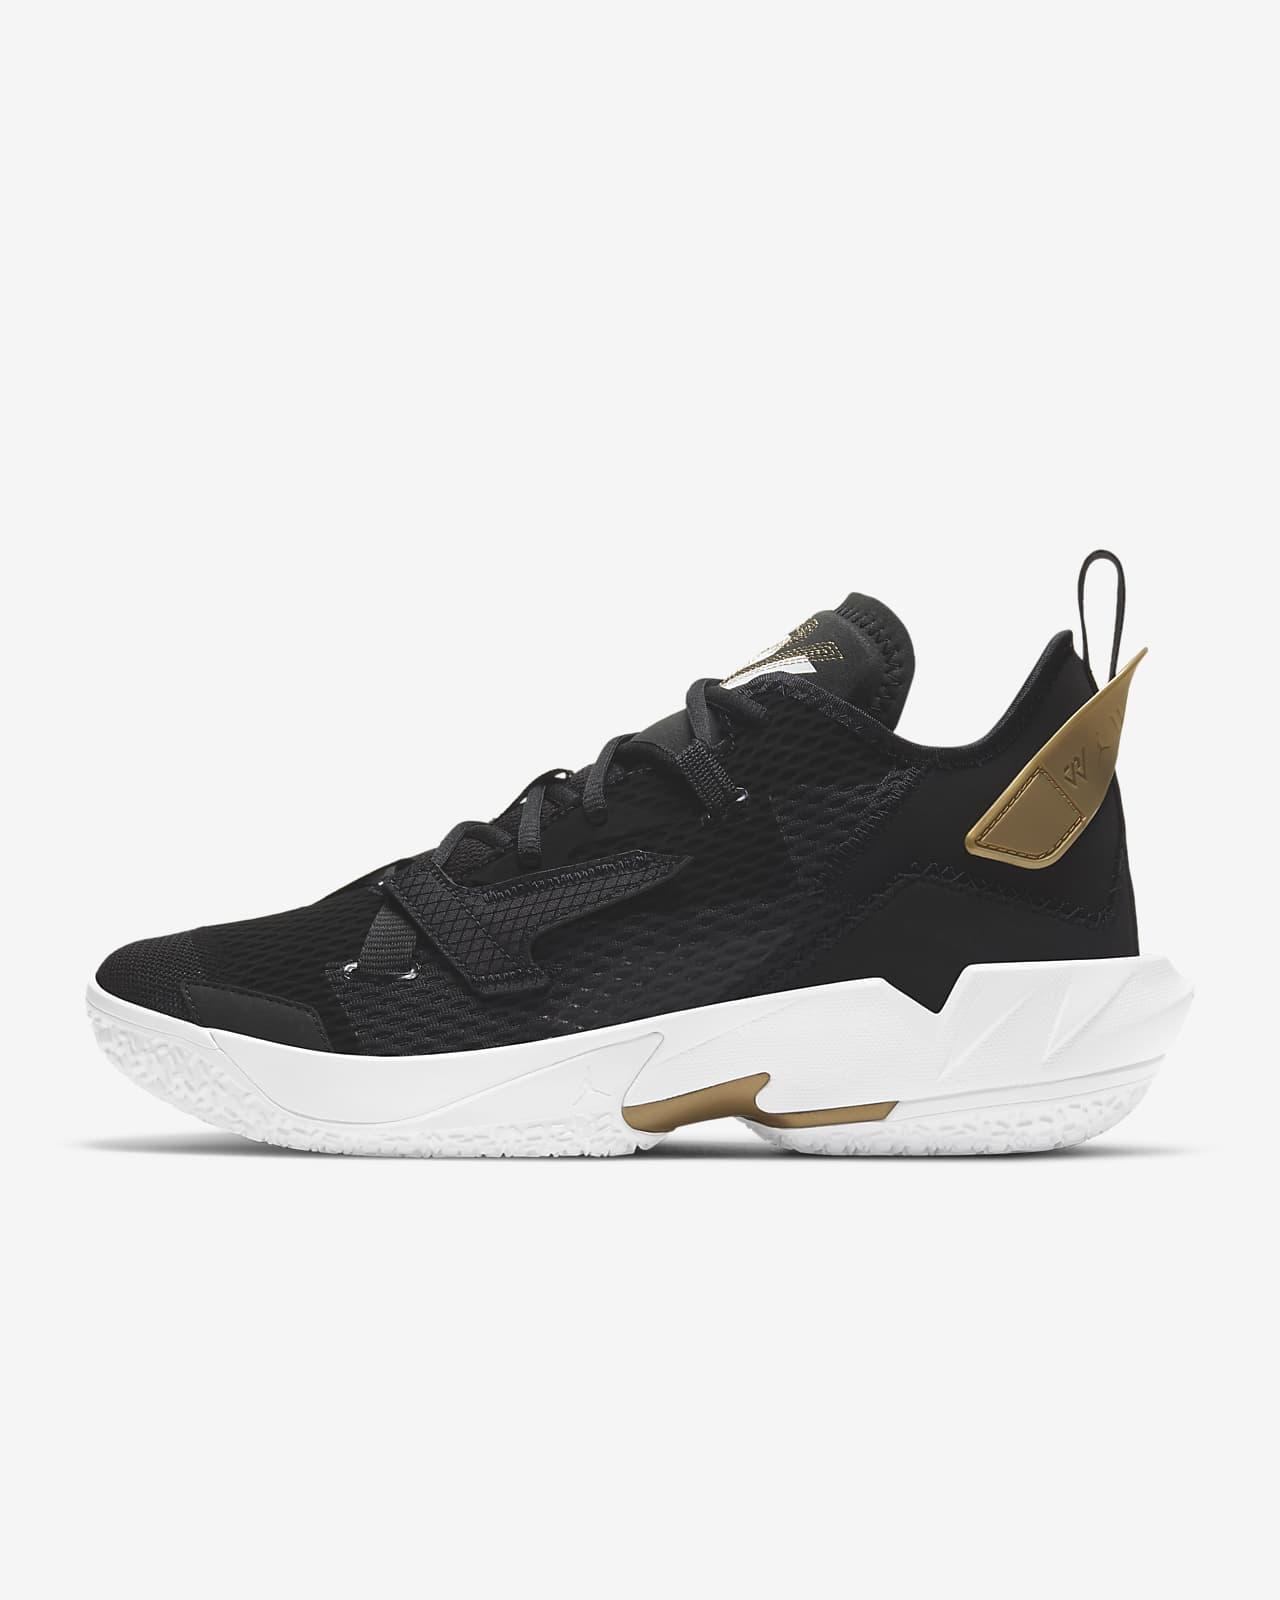 Jordan Why Not? Zer0.4 'Family' Basketball Shoe